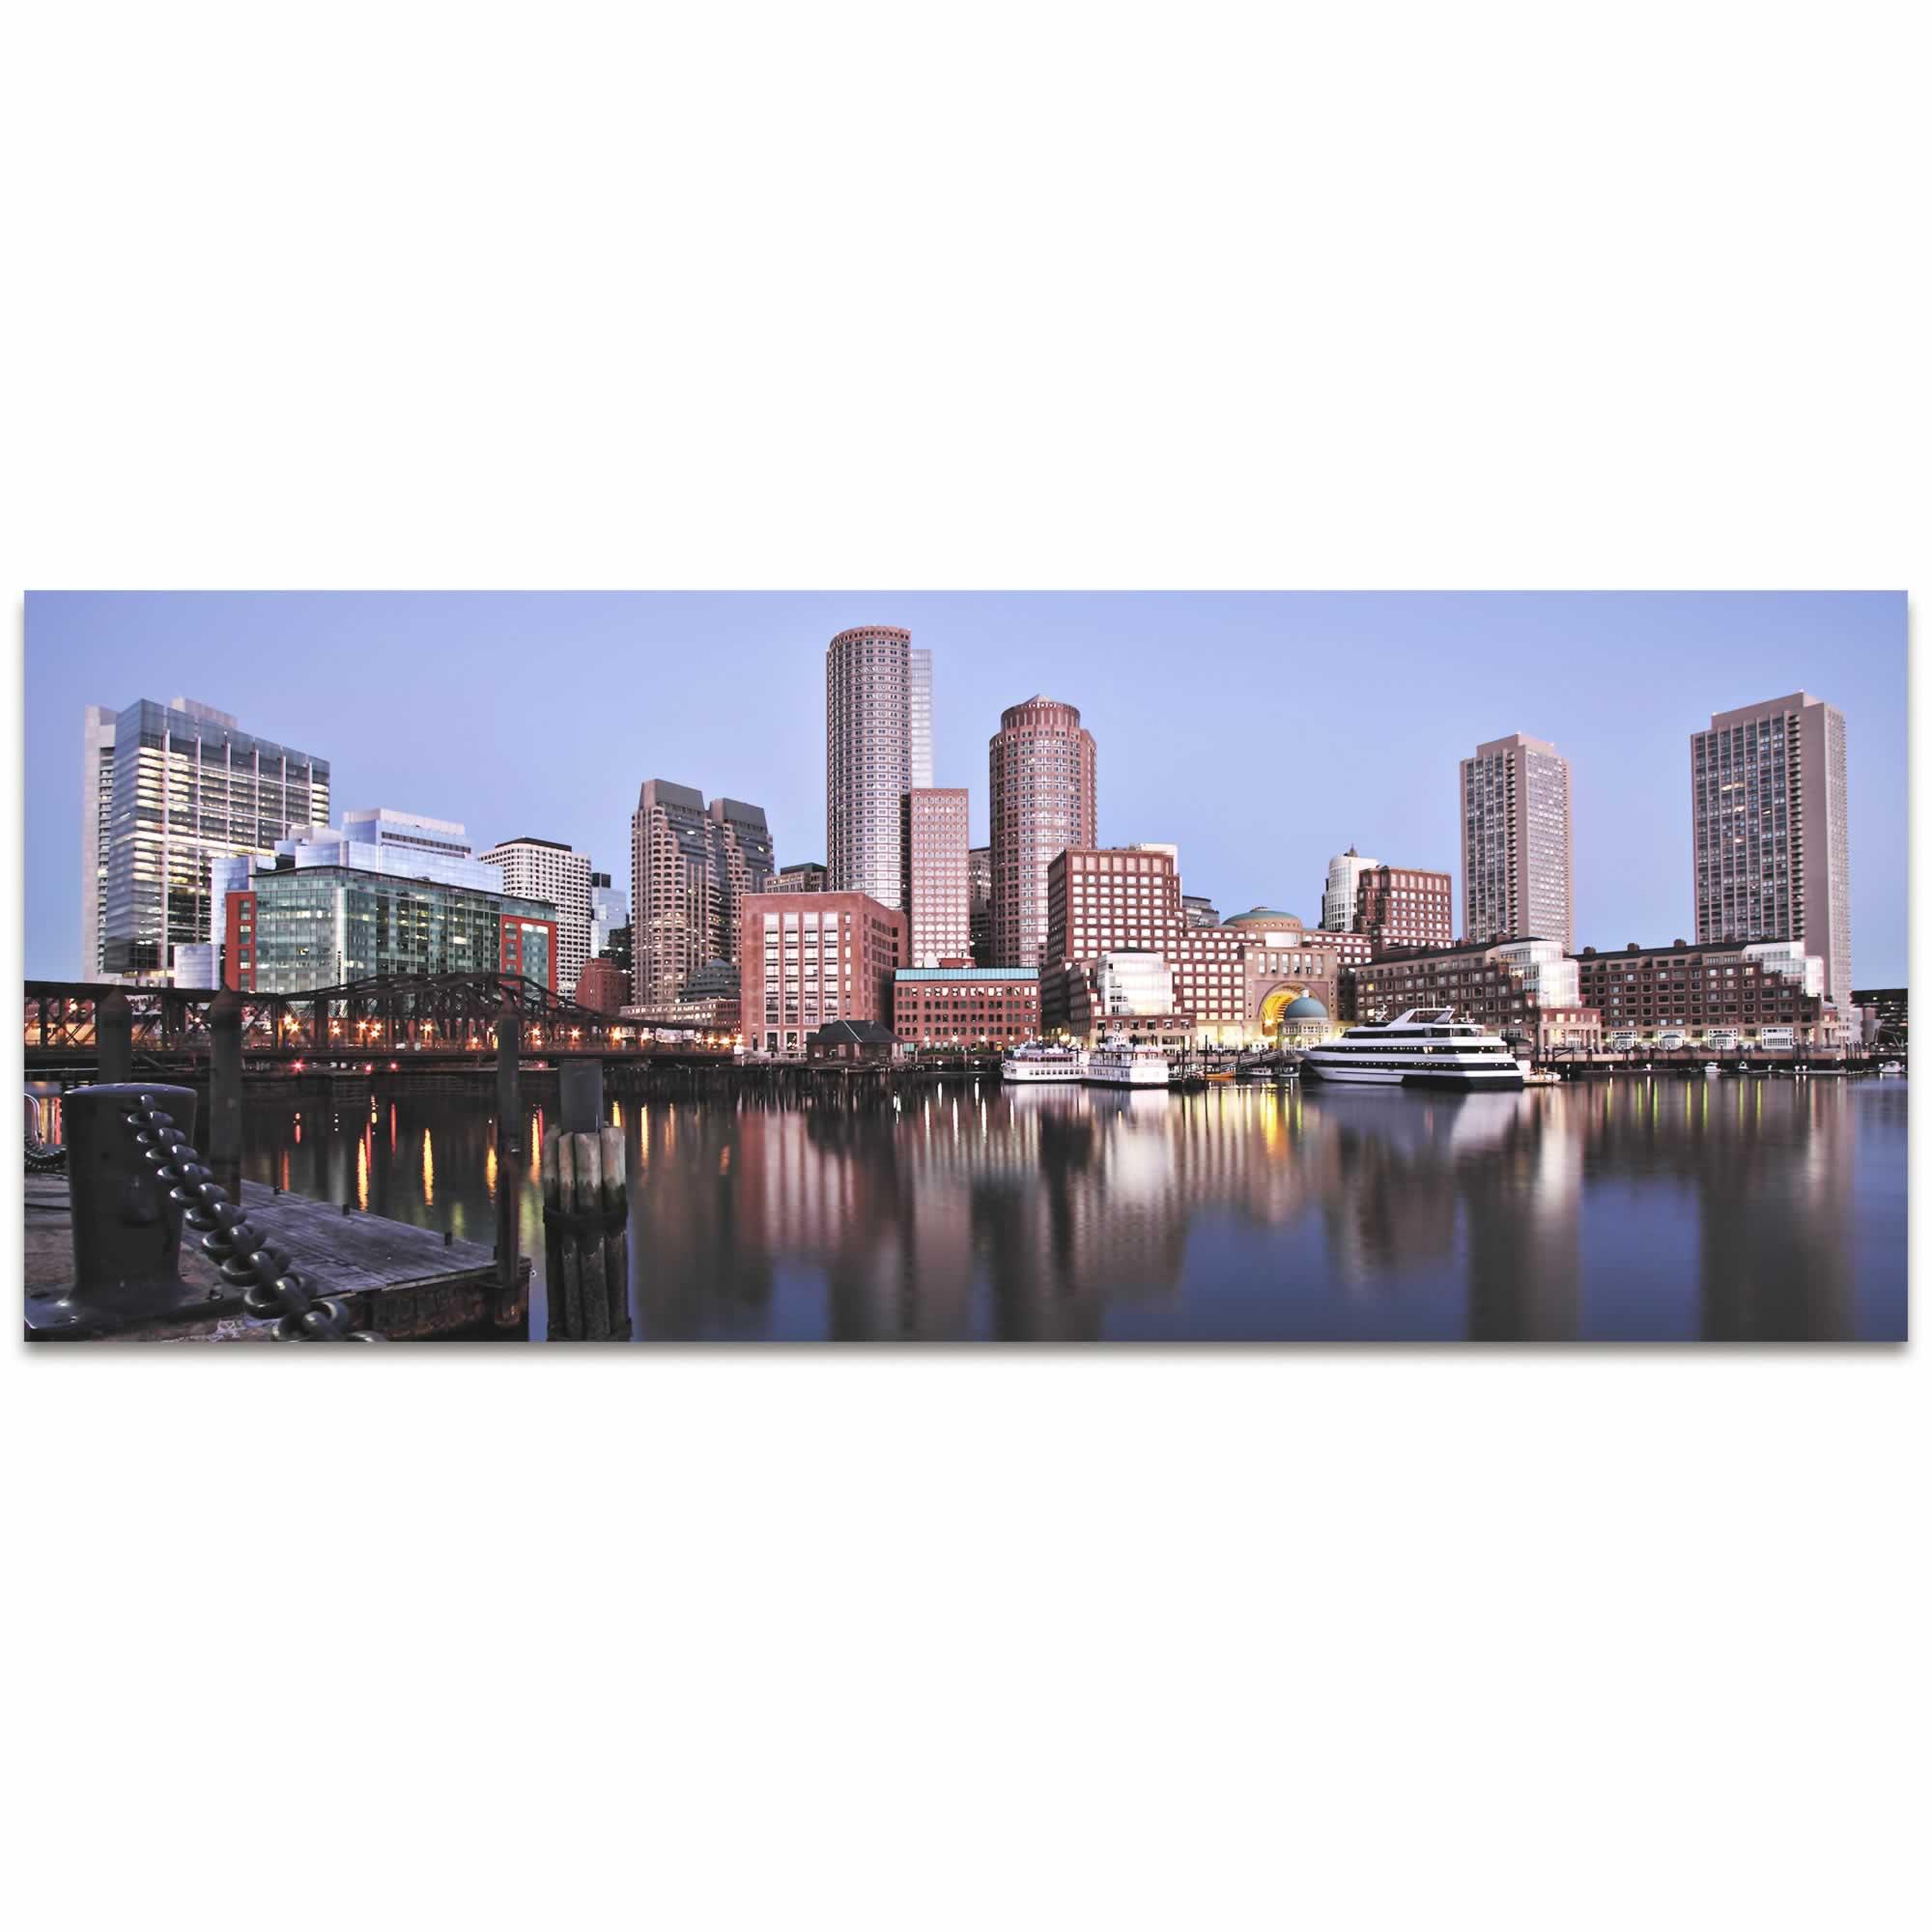 Boston City Skyline - Urban Modern Art, Designer Home Decor, Cityscape Wall Artwork, Trendy Contemporary Art - Alternate View 2